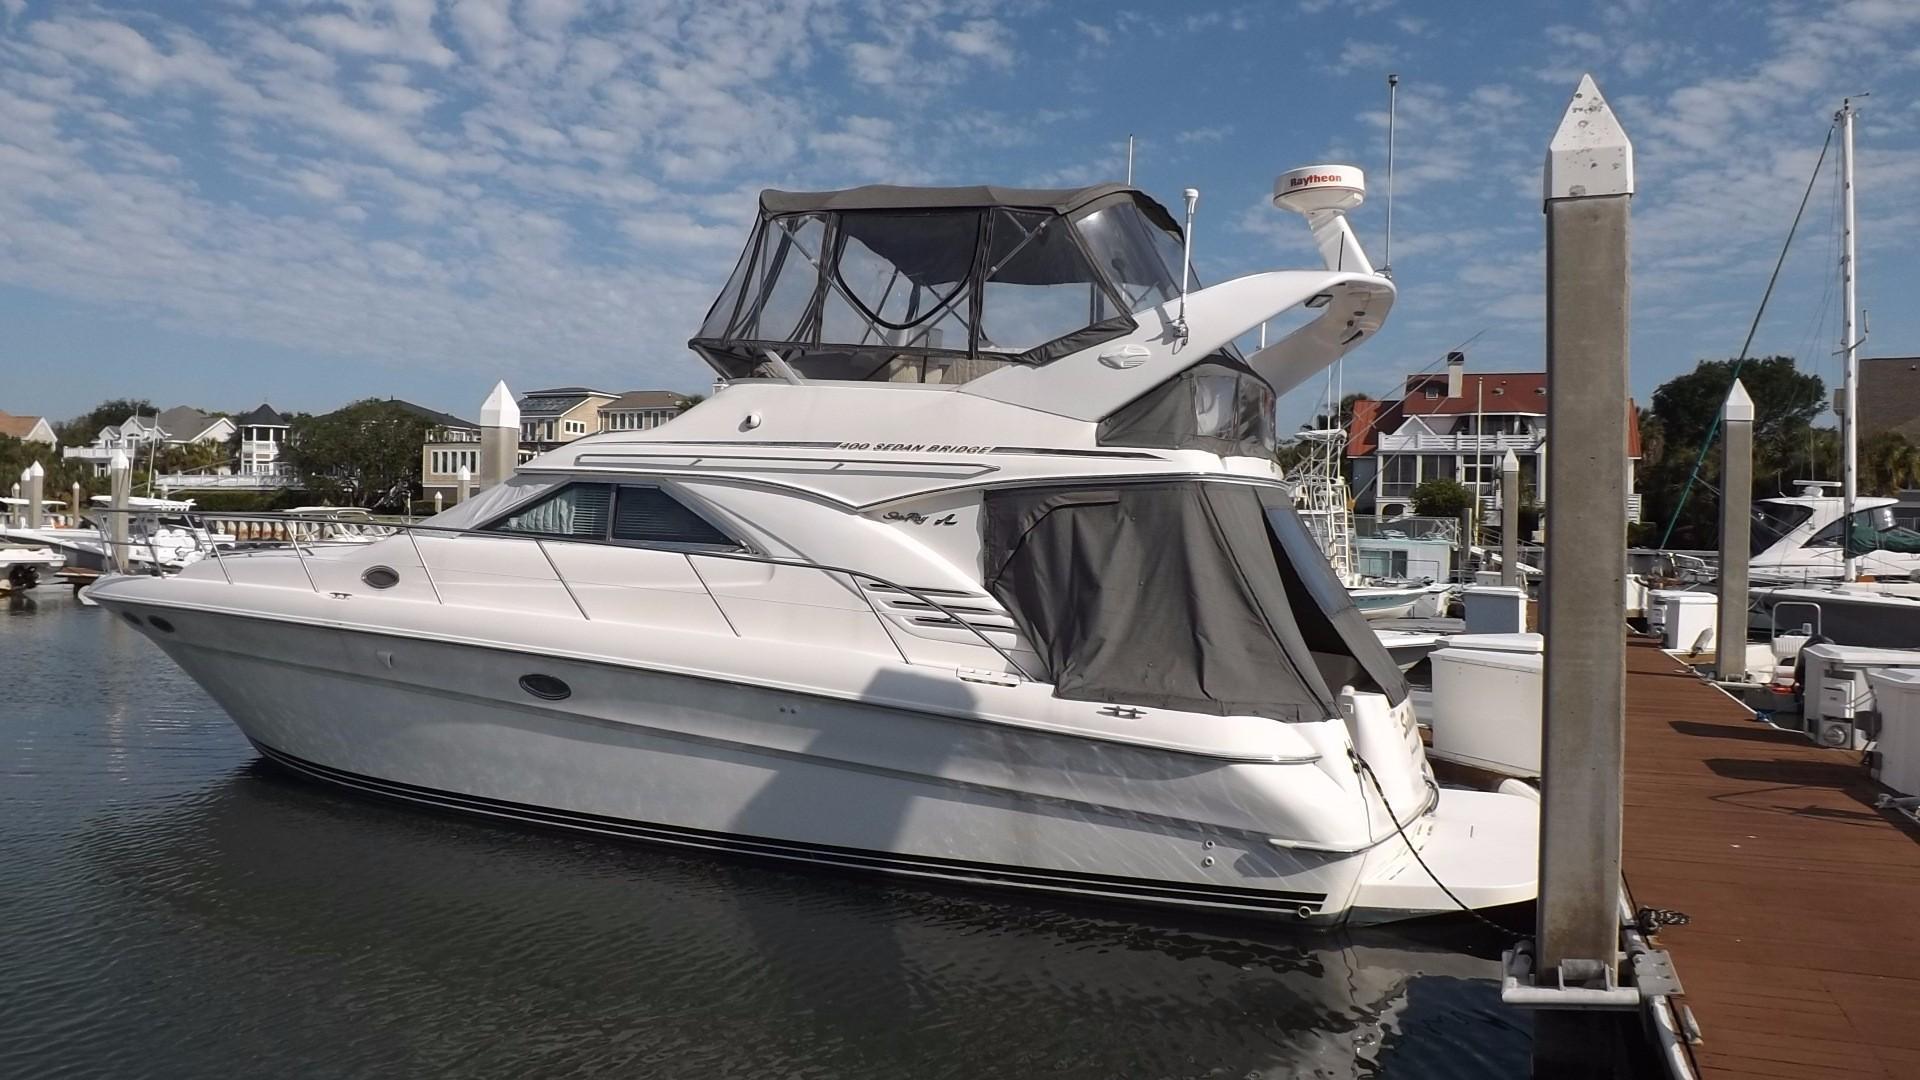 6231852_20170510134043621_1_XLARGE&w=924&h=693&t=1494452691000 1997 sea ray 400 sedan bridge power boat for sale www yachtworld com  at honlapkeszites.co